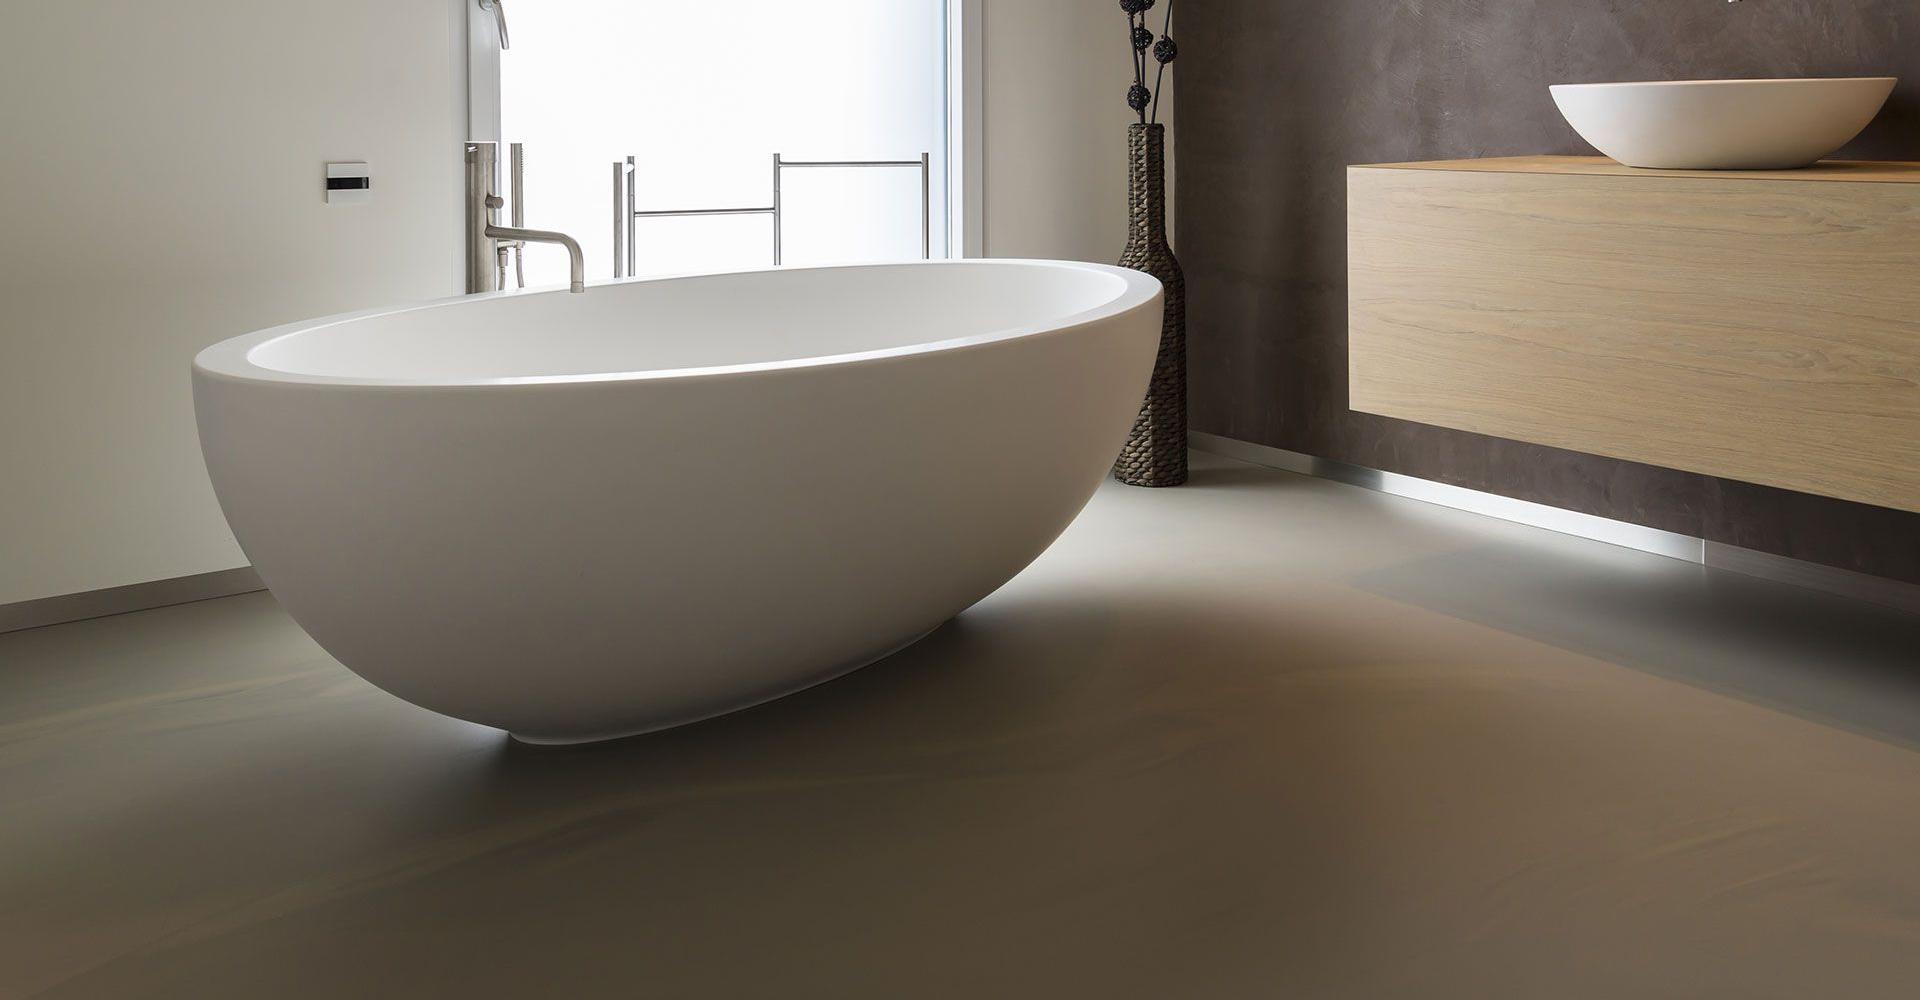 Gietvloer betonlook badkamer